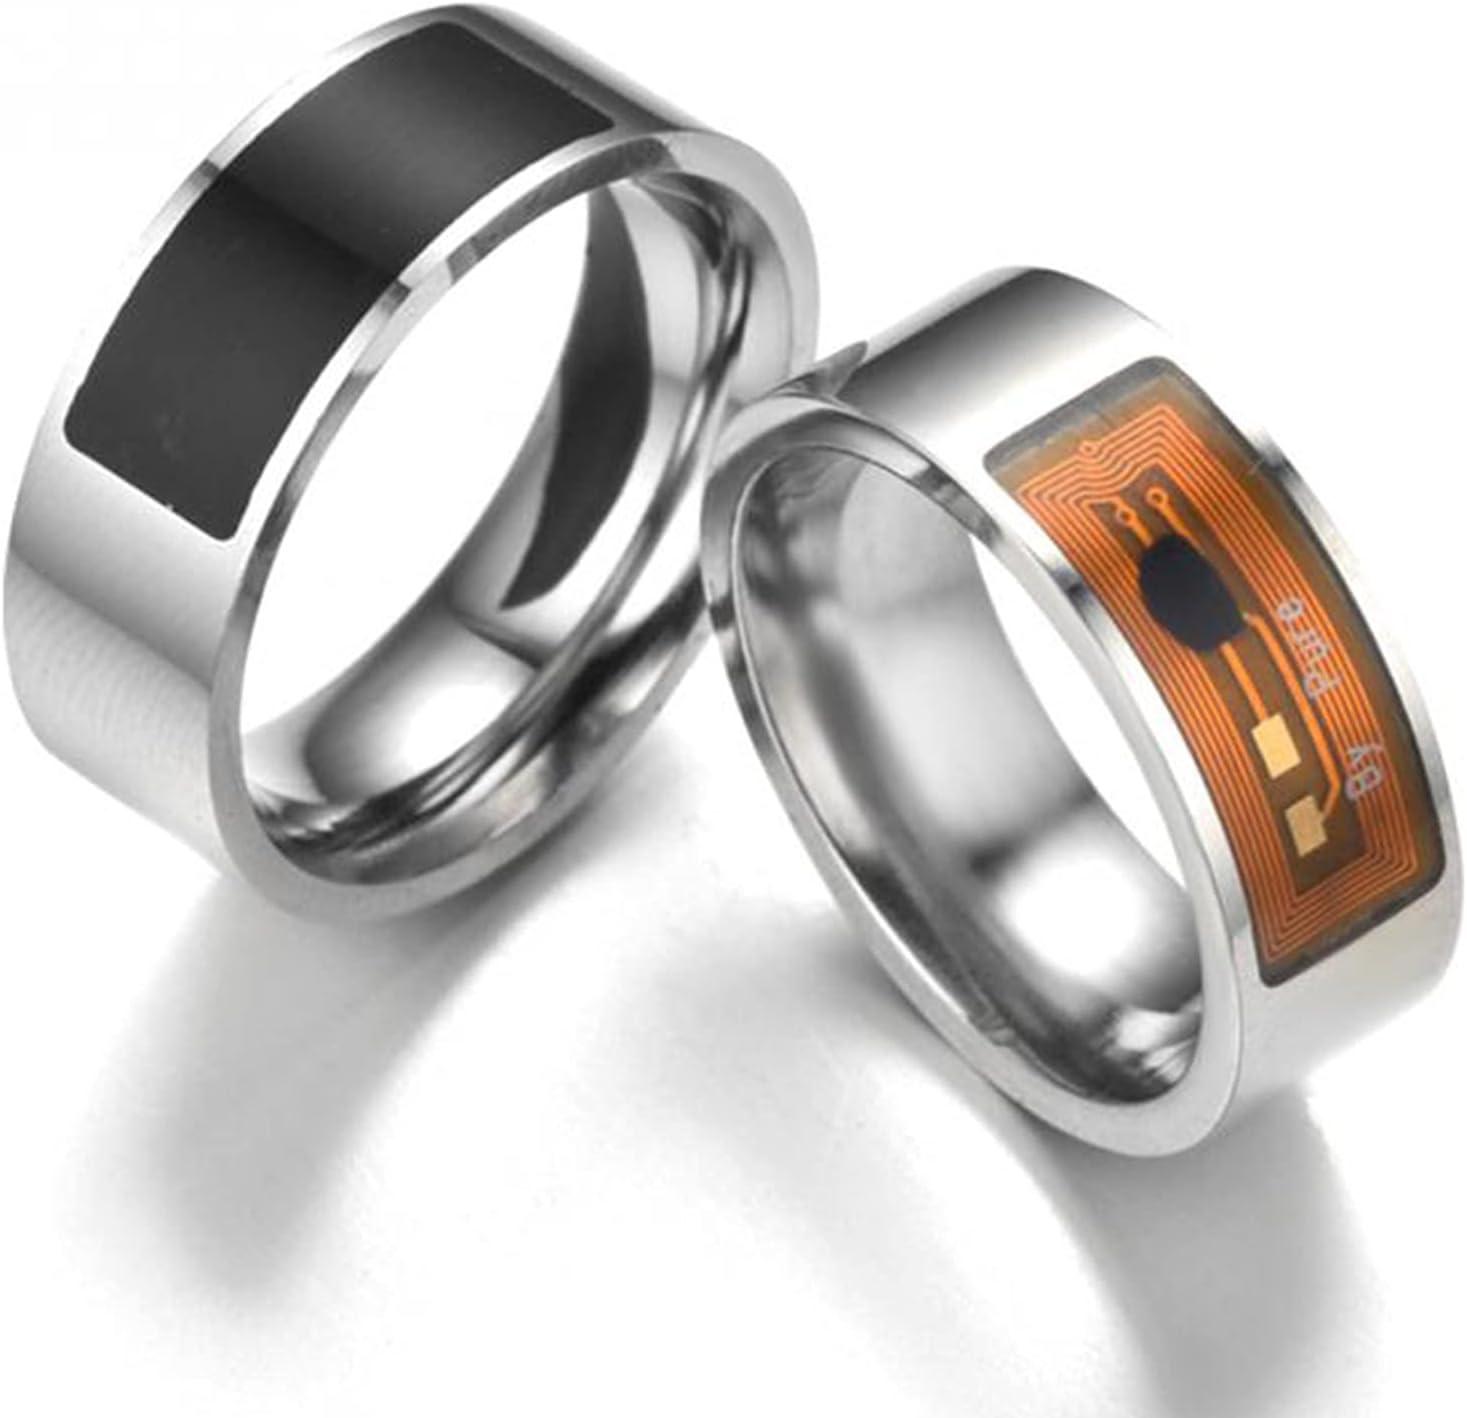 IYUNDUN NFC Men Magic Ring, Fashion Multifunctional Wearable Digital Waterproof Intelligent Finger Rings,Creative Useful Accessory Finger Control Ring (Color : Black, Size : 10#)